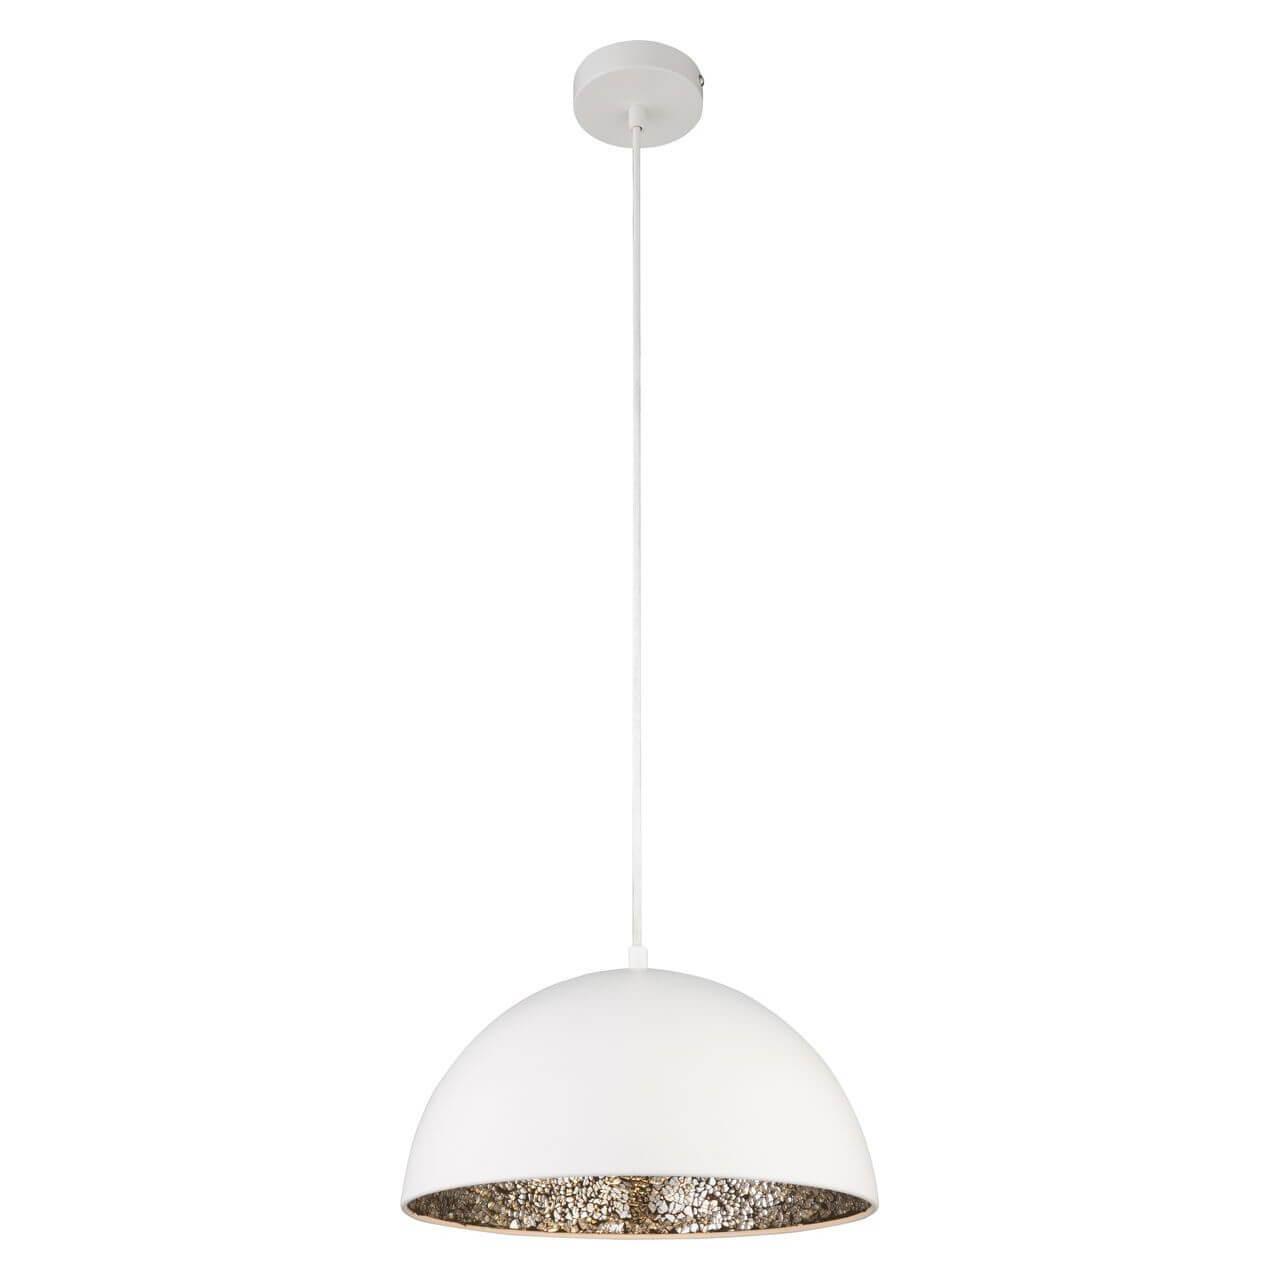 Подвесной светильник Globo 15166W, E27, 60 Вт подвесной светильник globo okko 15166w